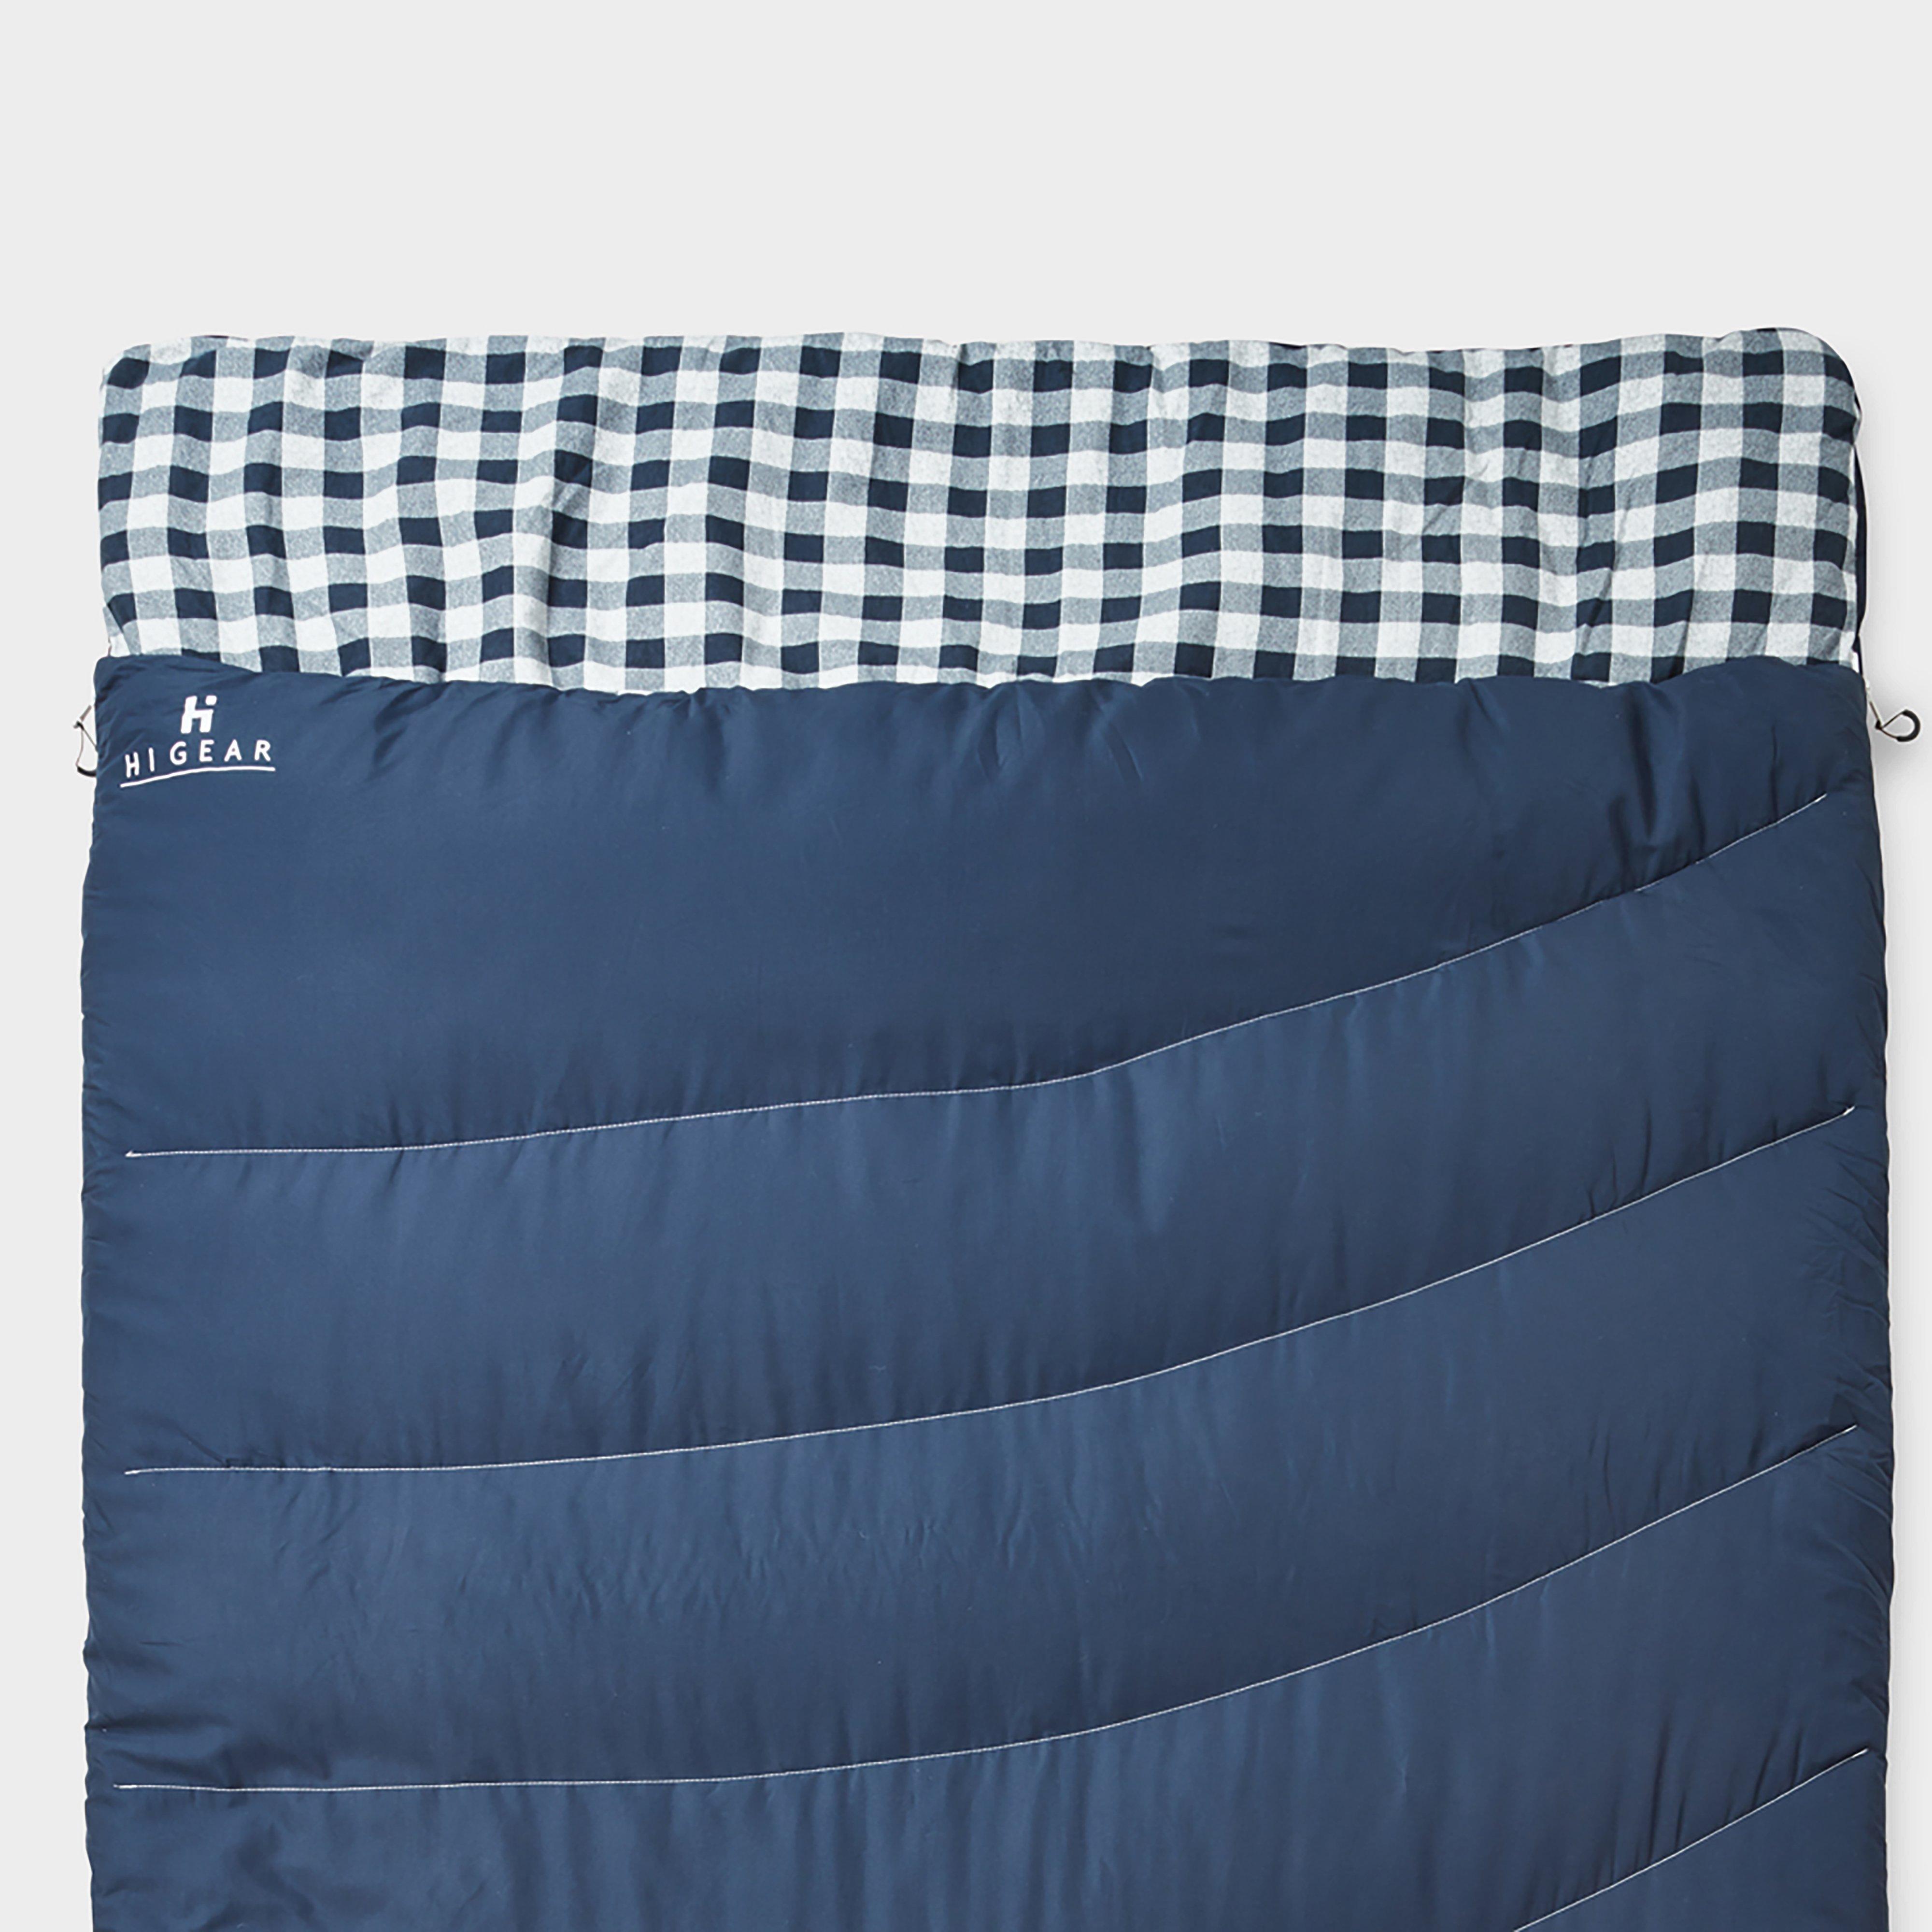 Hi Gear Composure Double Sleeping Bag